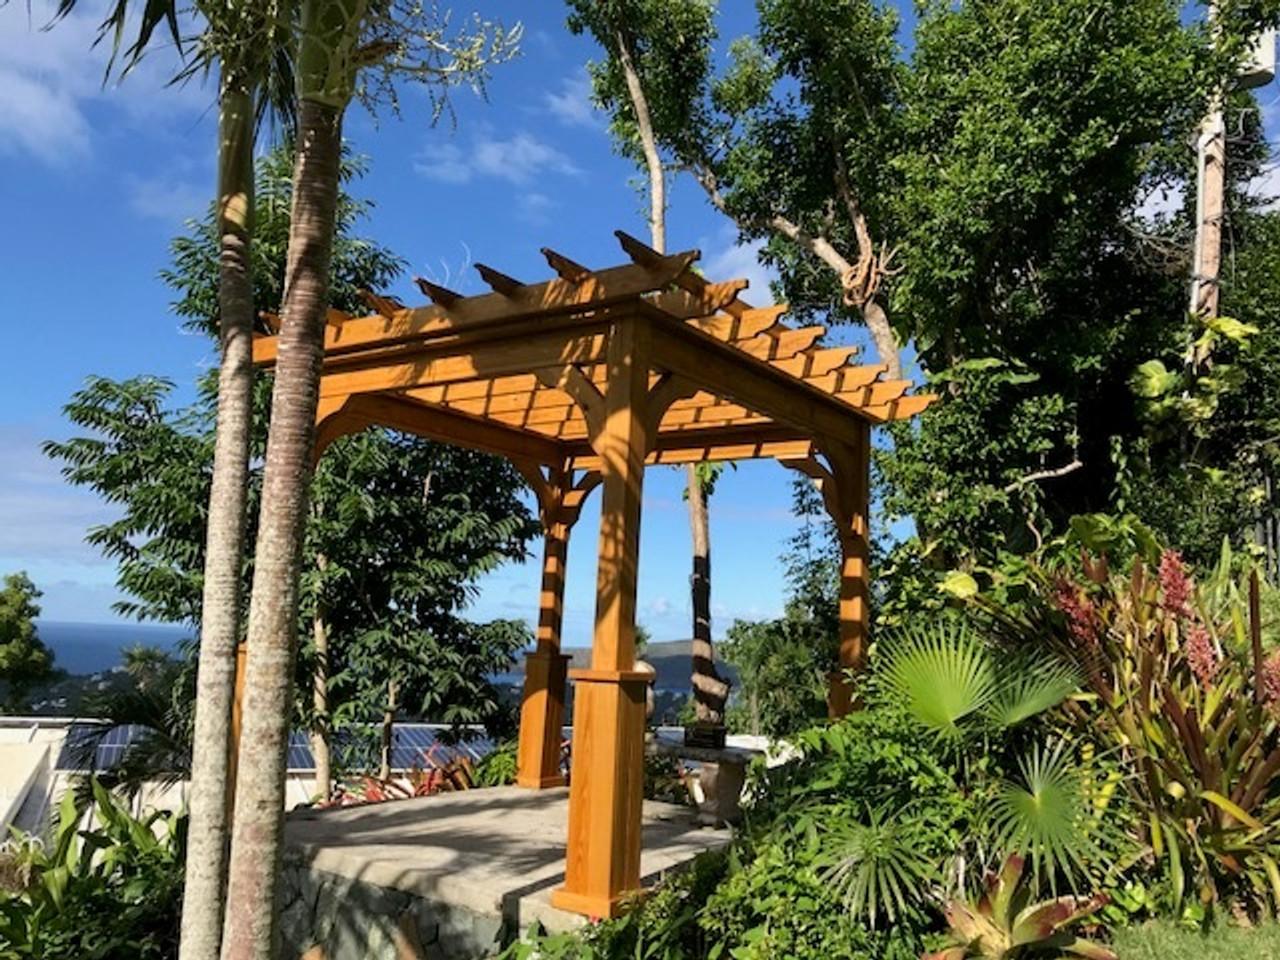 10x10 Pressure Treated Pine Serenity Pergola Kit Tranquility, U.S. Virgin Islands